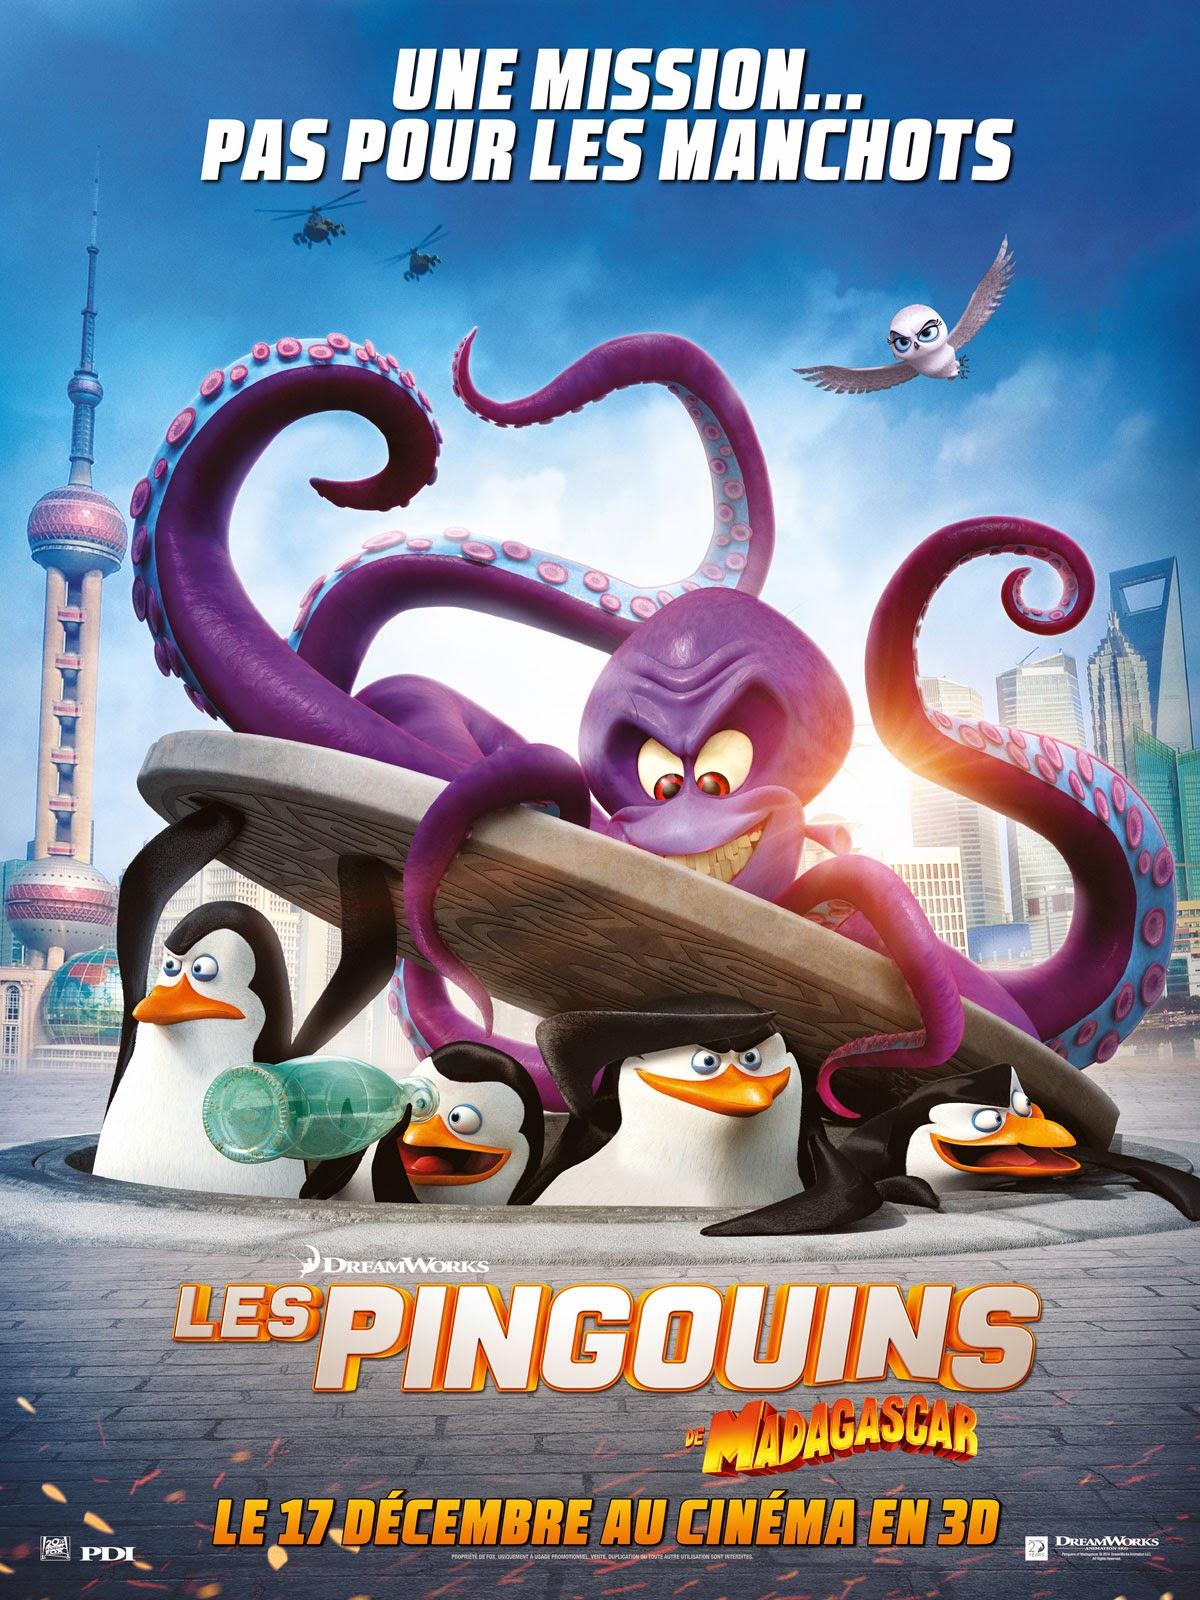 http://fuckingcinephiles.blogspot.fr/2014/12/critique-les-pingouins-de-madagascar.html